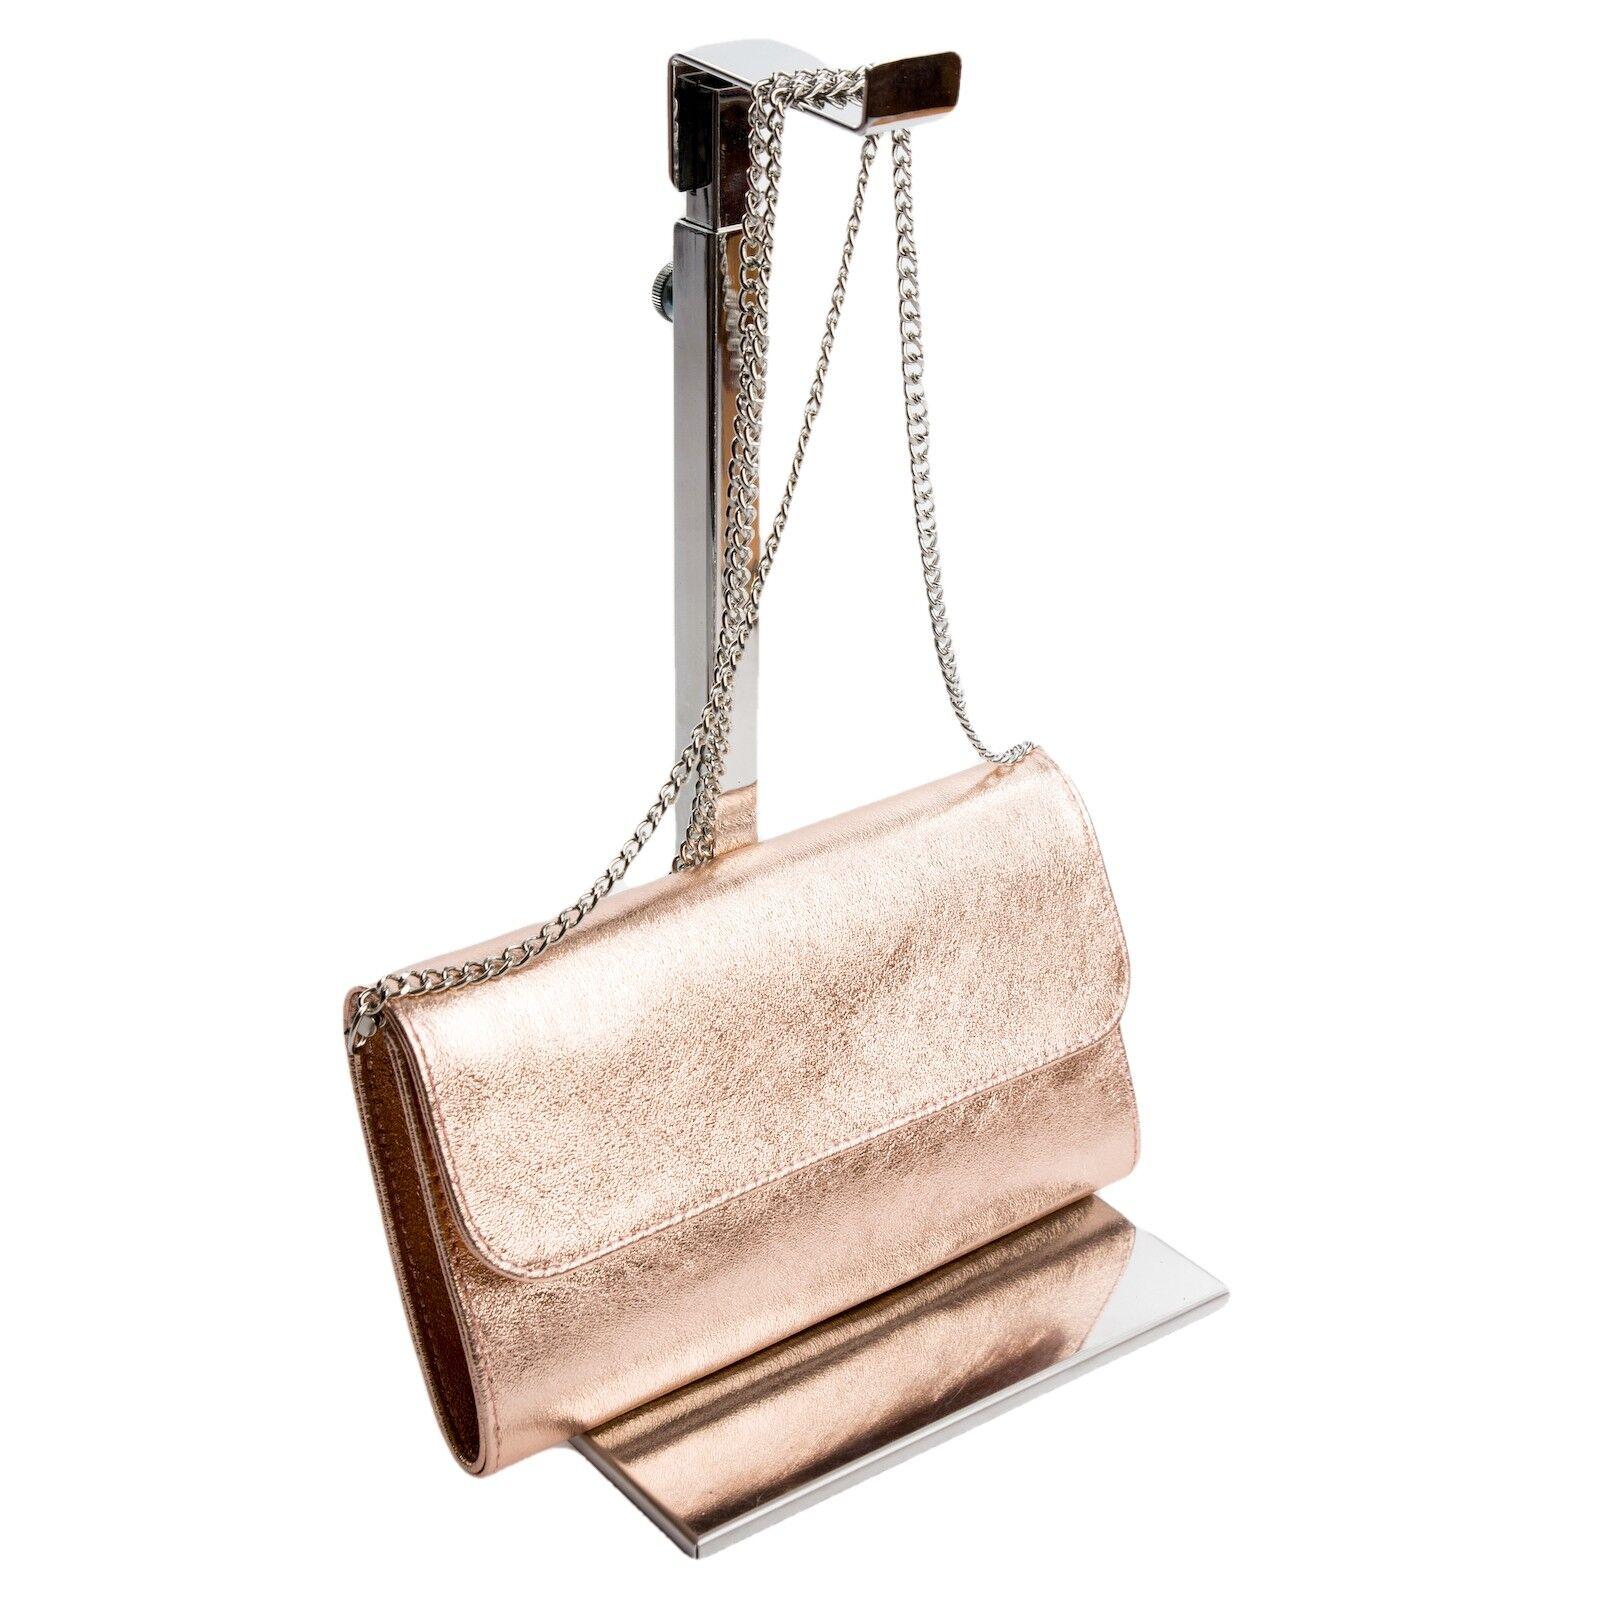 Ital. Baguette Abendtasche Pochette Clutch Rosé Gold metallic ECHT LEDER 872RG